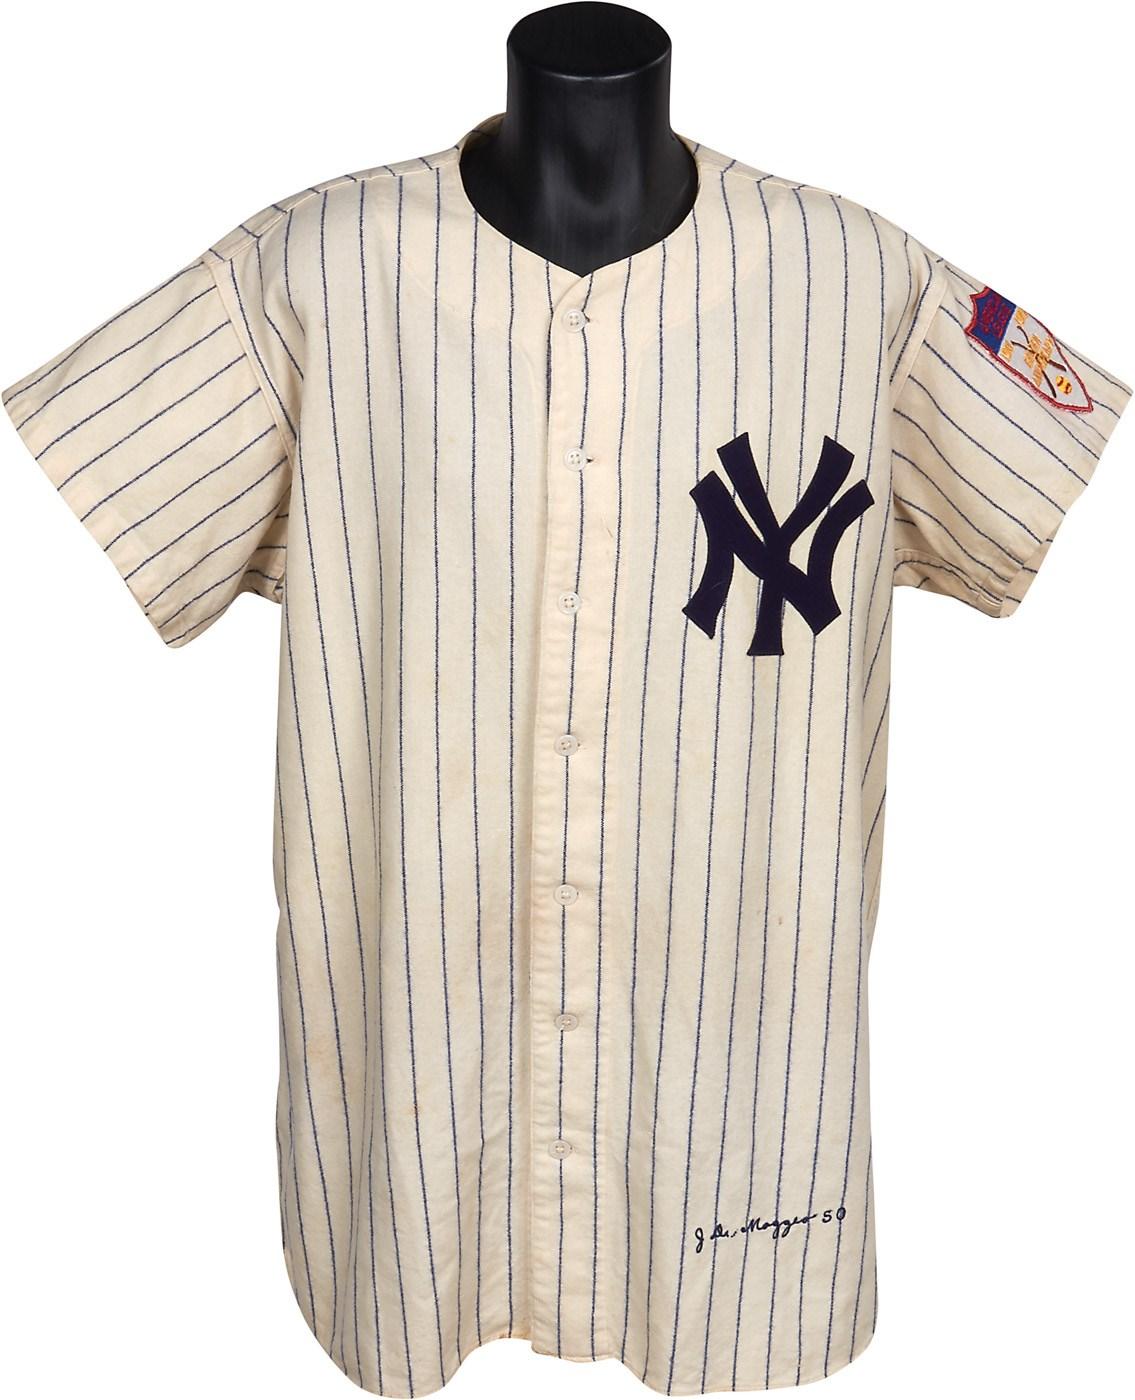 low priced a0798 7ad99 1950-51 Joe DiMaggio New York Yankees Game Worn Uniform ...